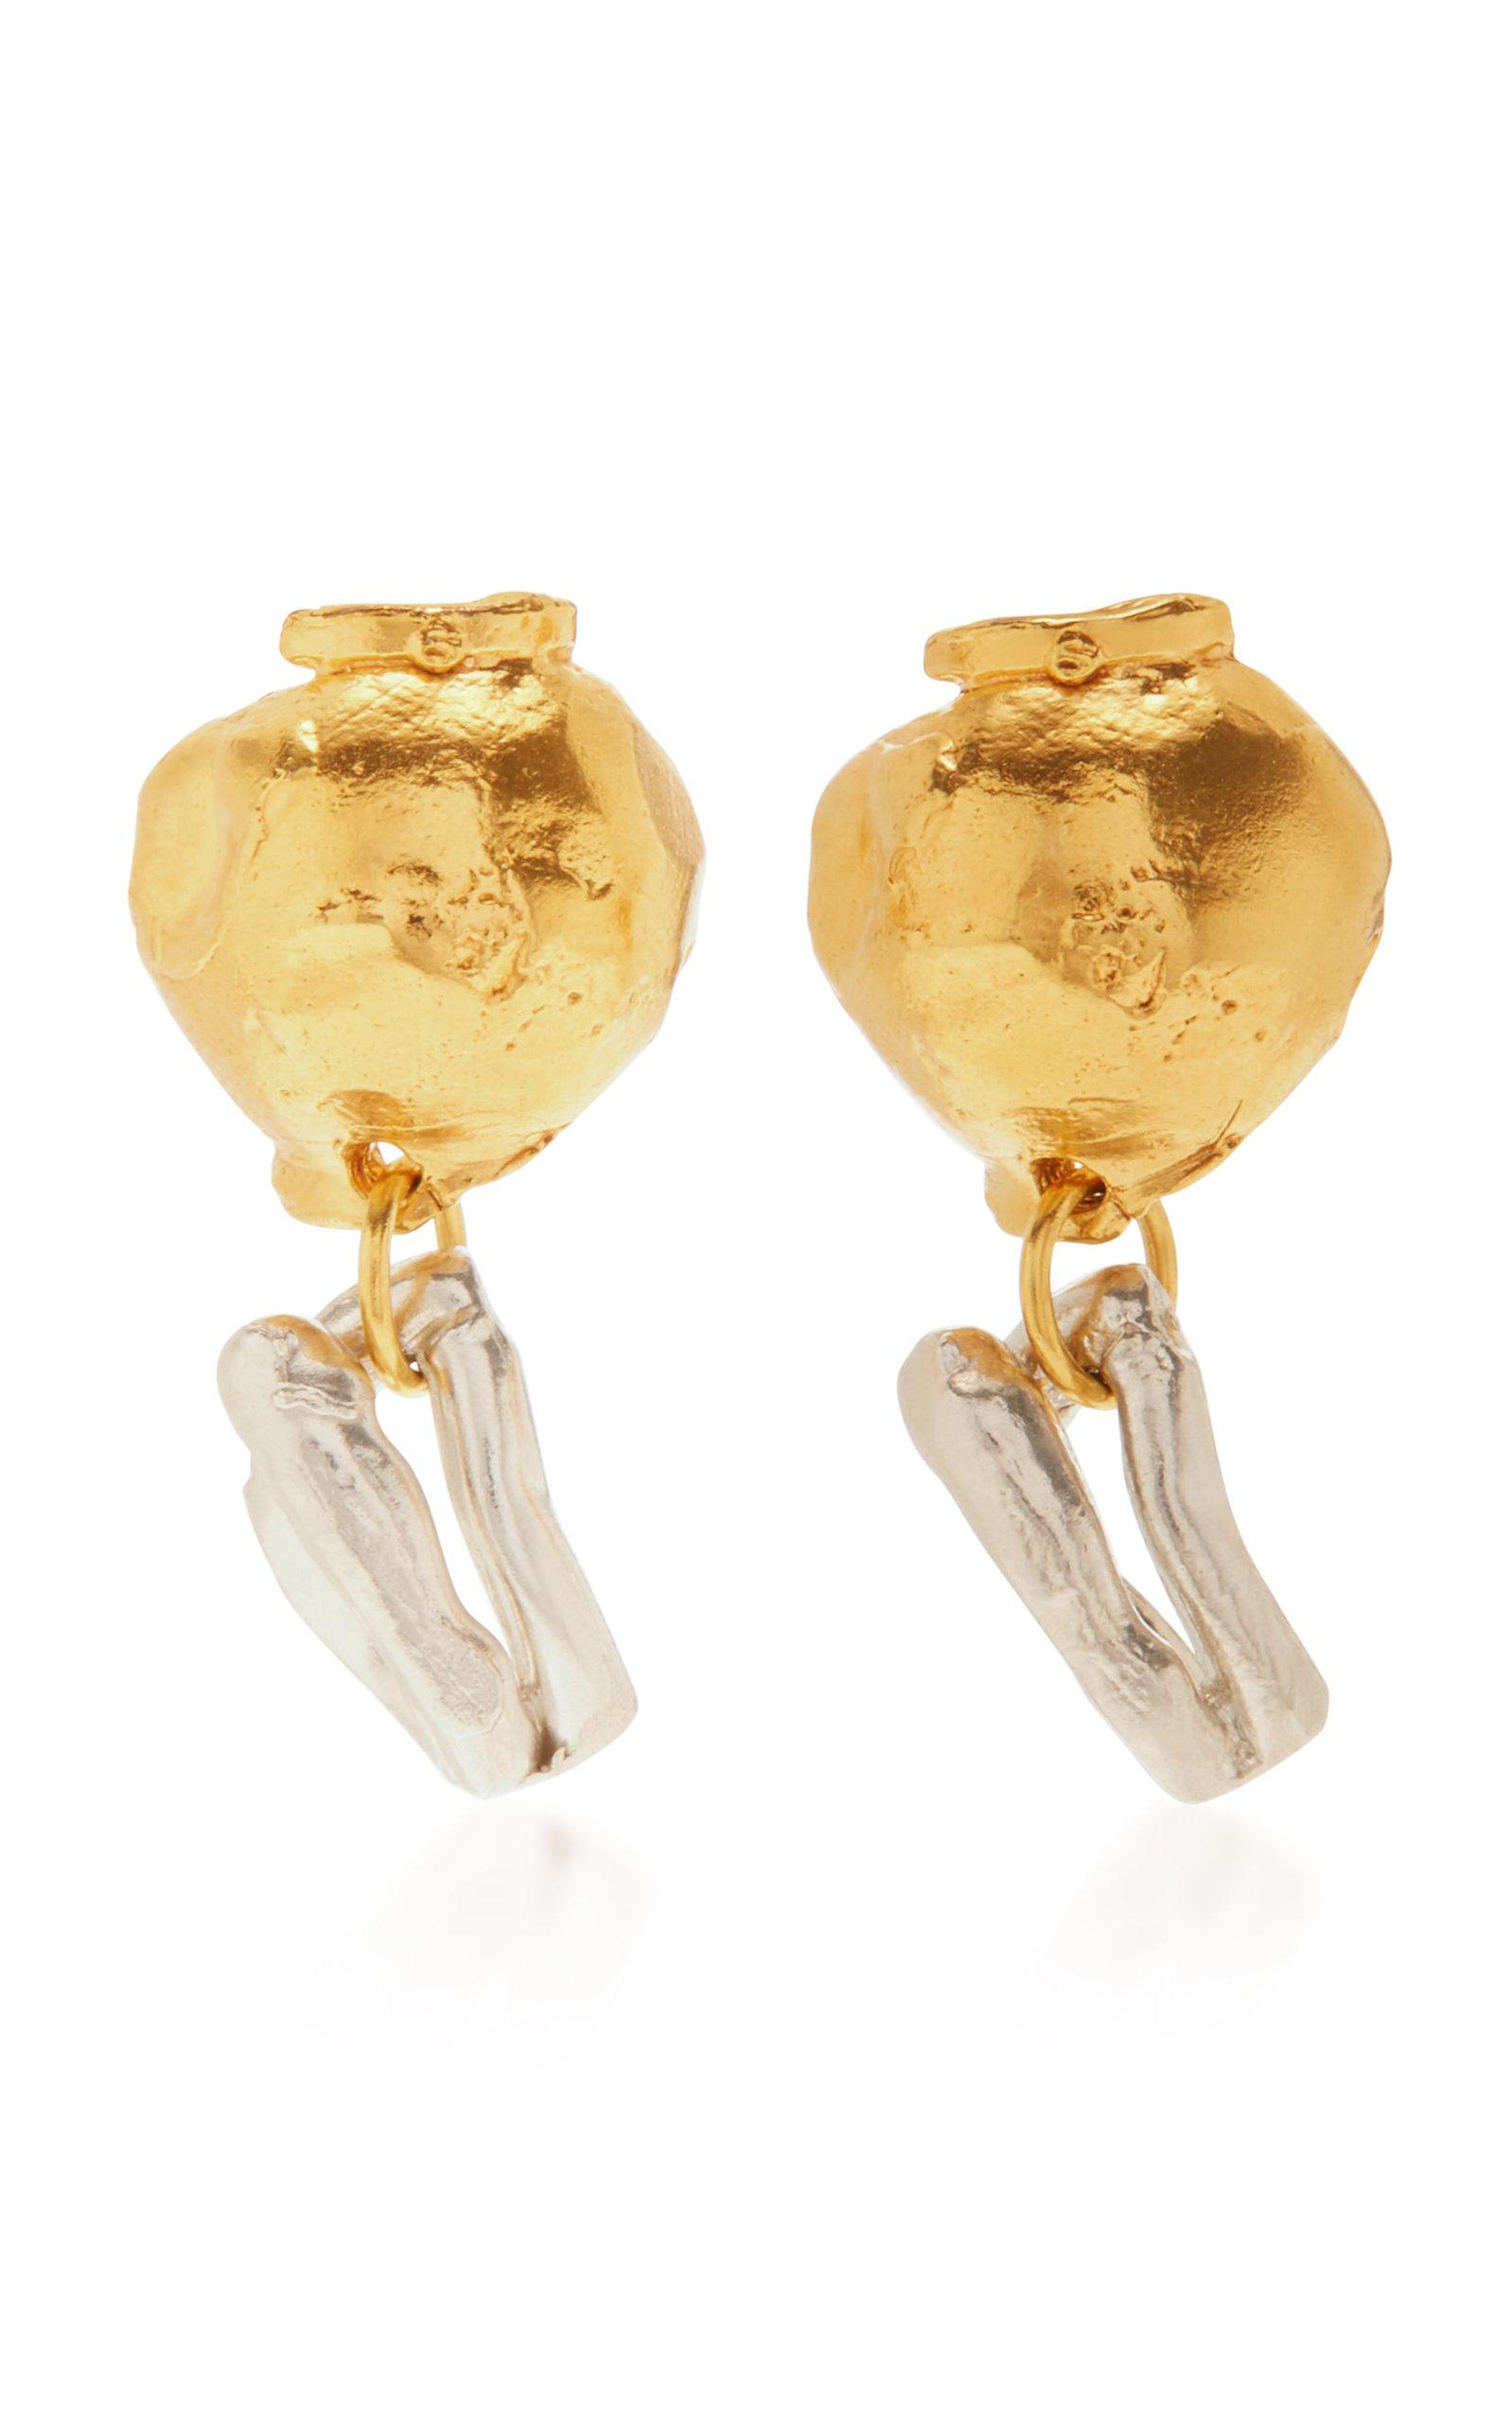 Alighieri   Alighieri 24K Gold-Plated And Pearl Earrings   Clouty